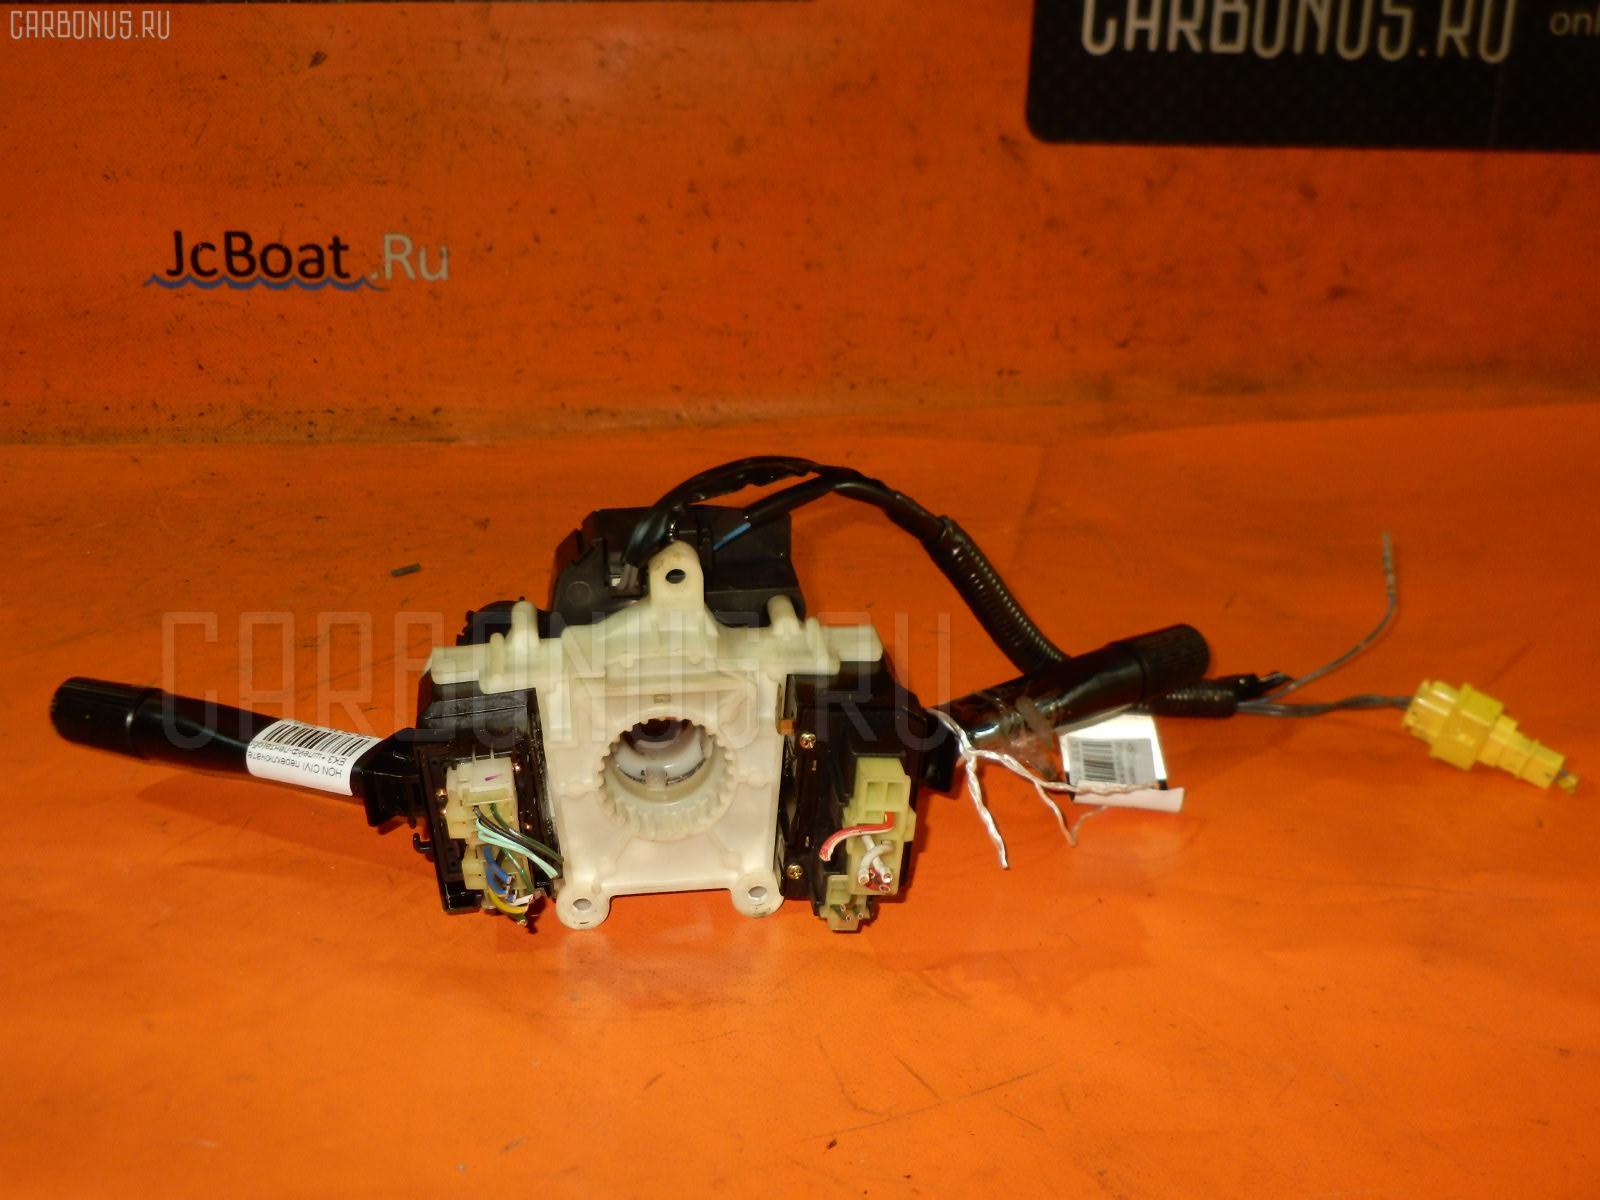 Переключатель поворотов HONDA CIVIC EK3. Фото 4